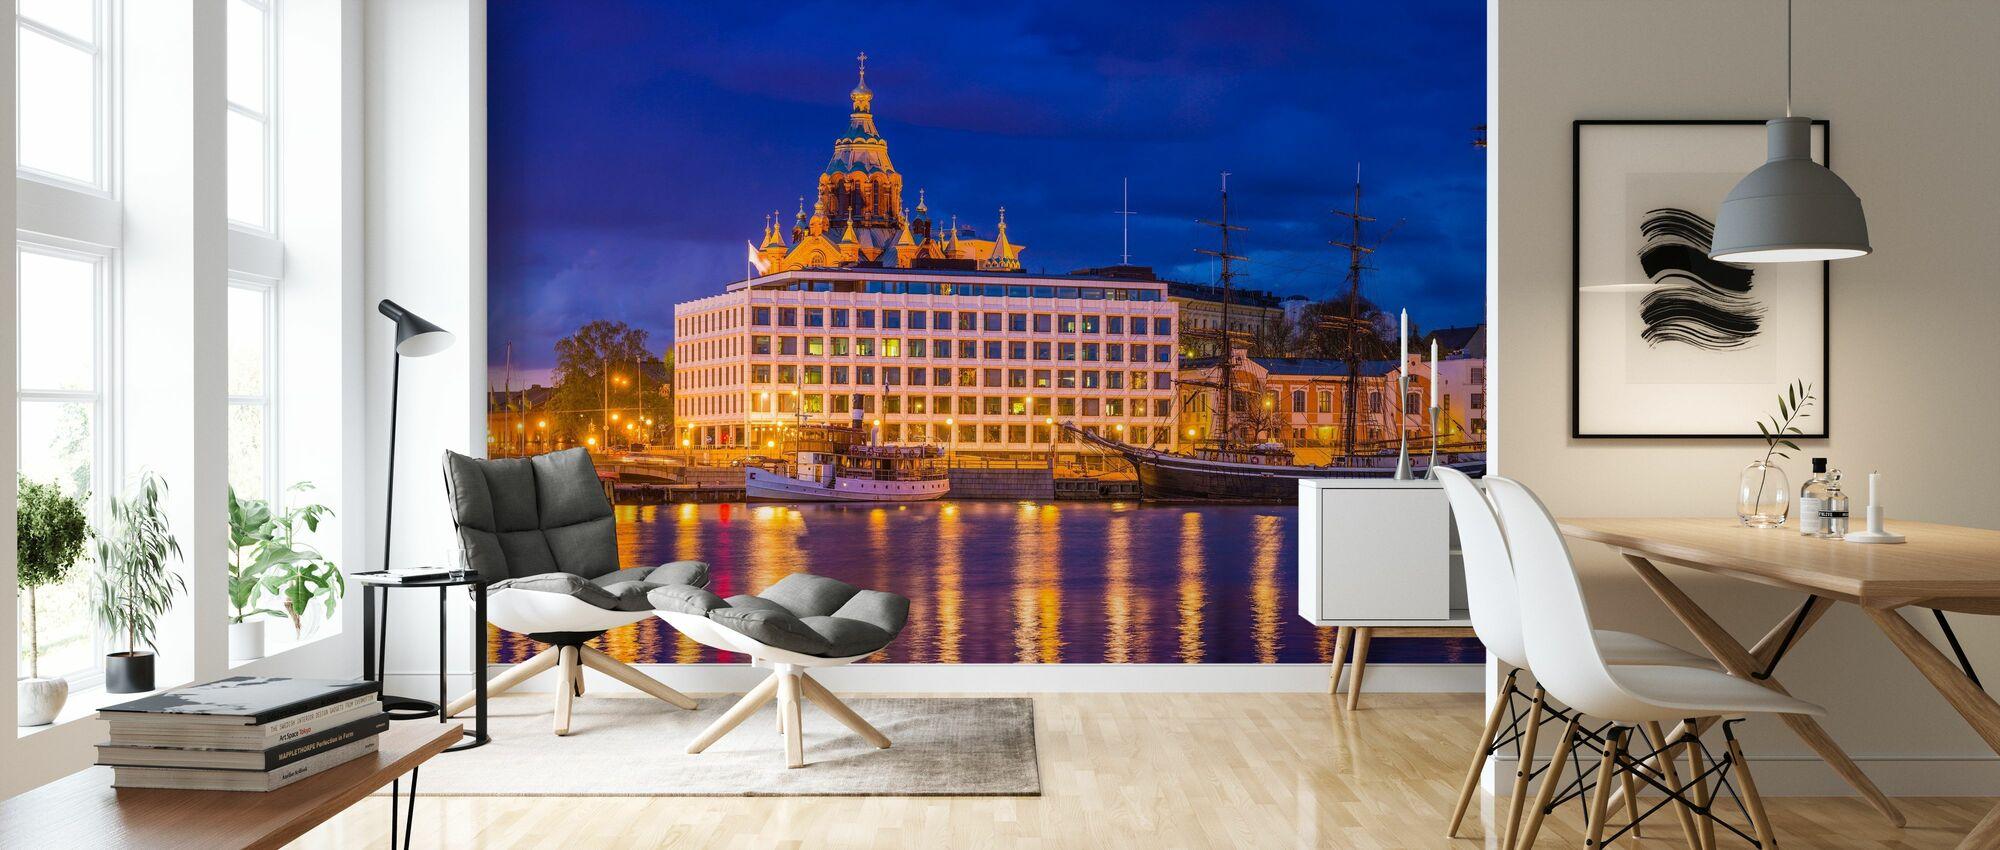 Helsinki Harbour Waterfront - Wallpaper - Living Room